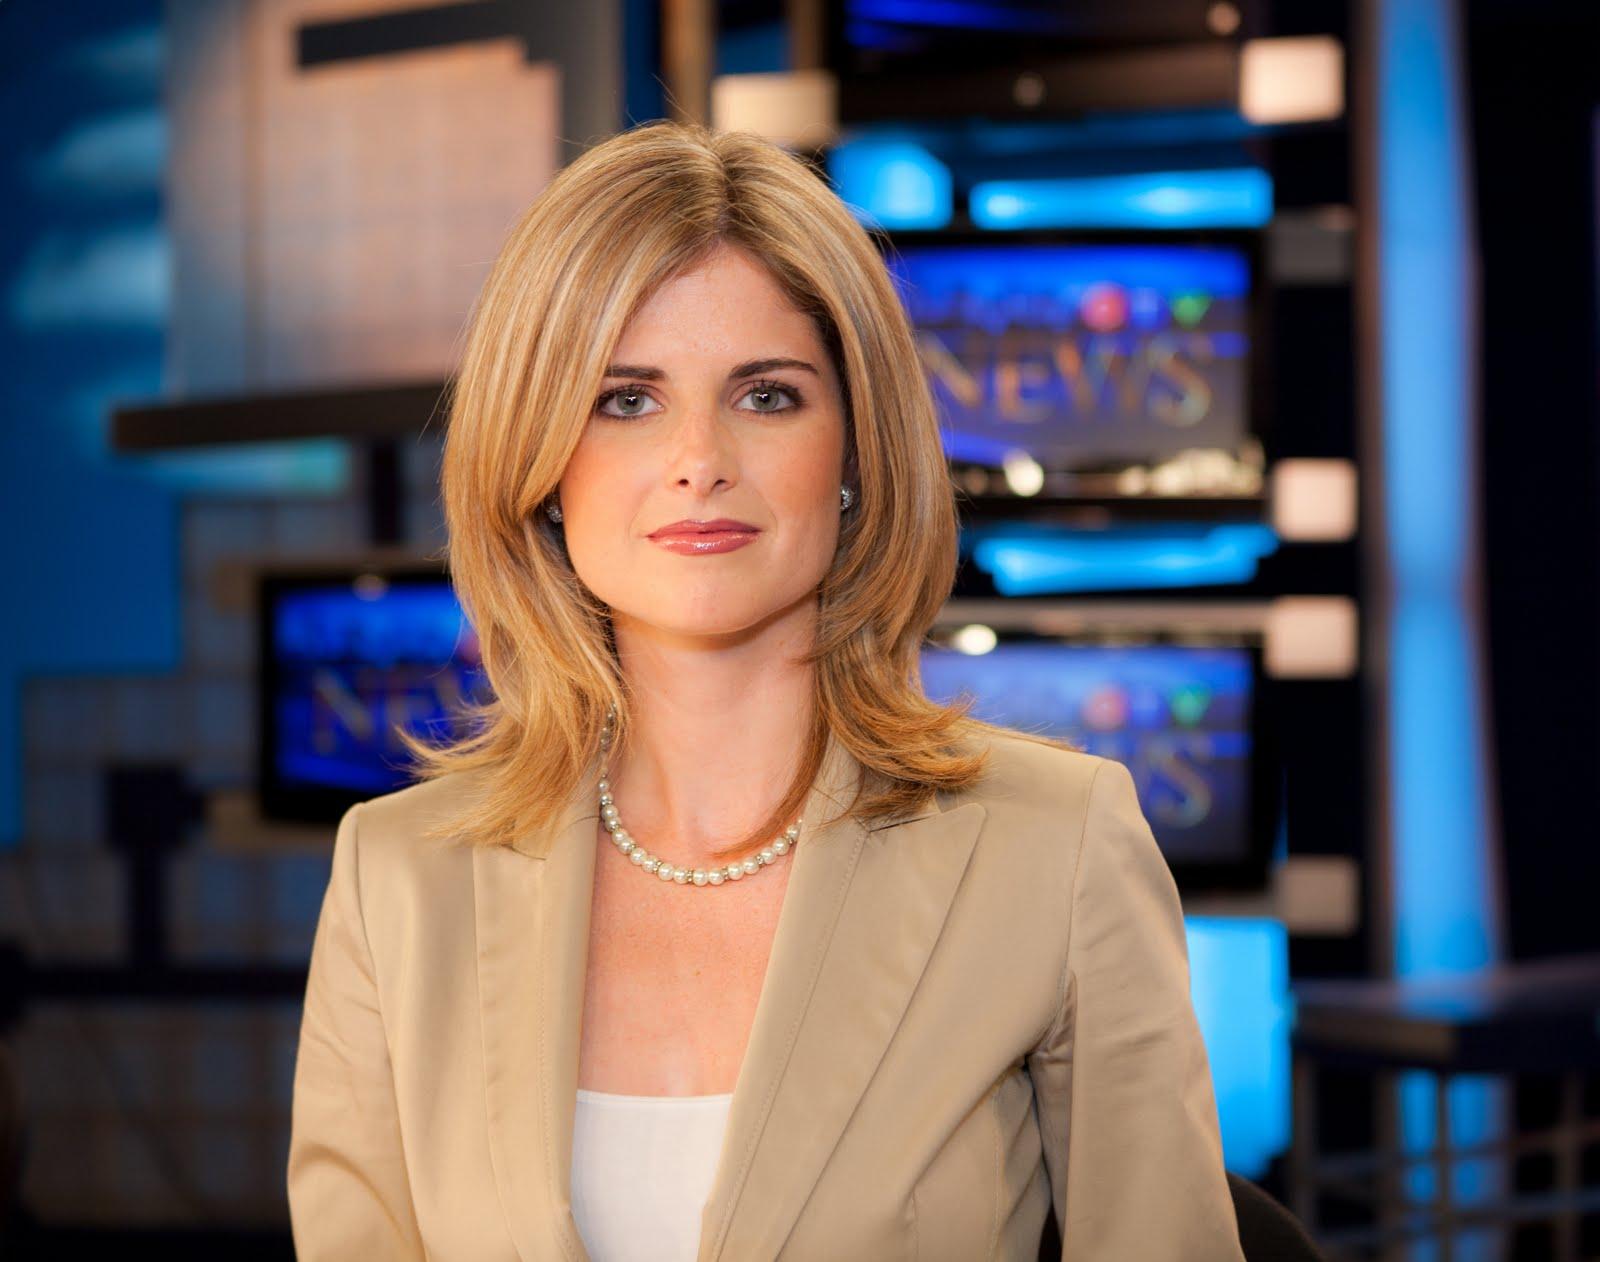 wpec news 12 anchors - psychologyarticles info